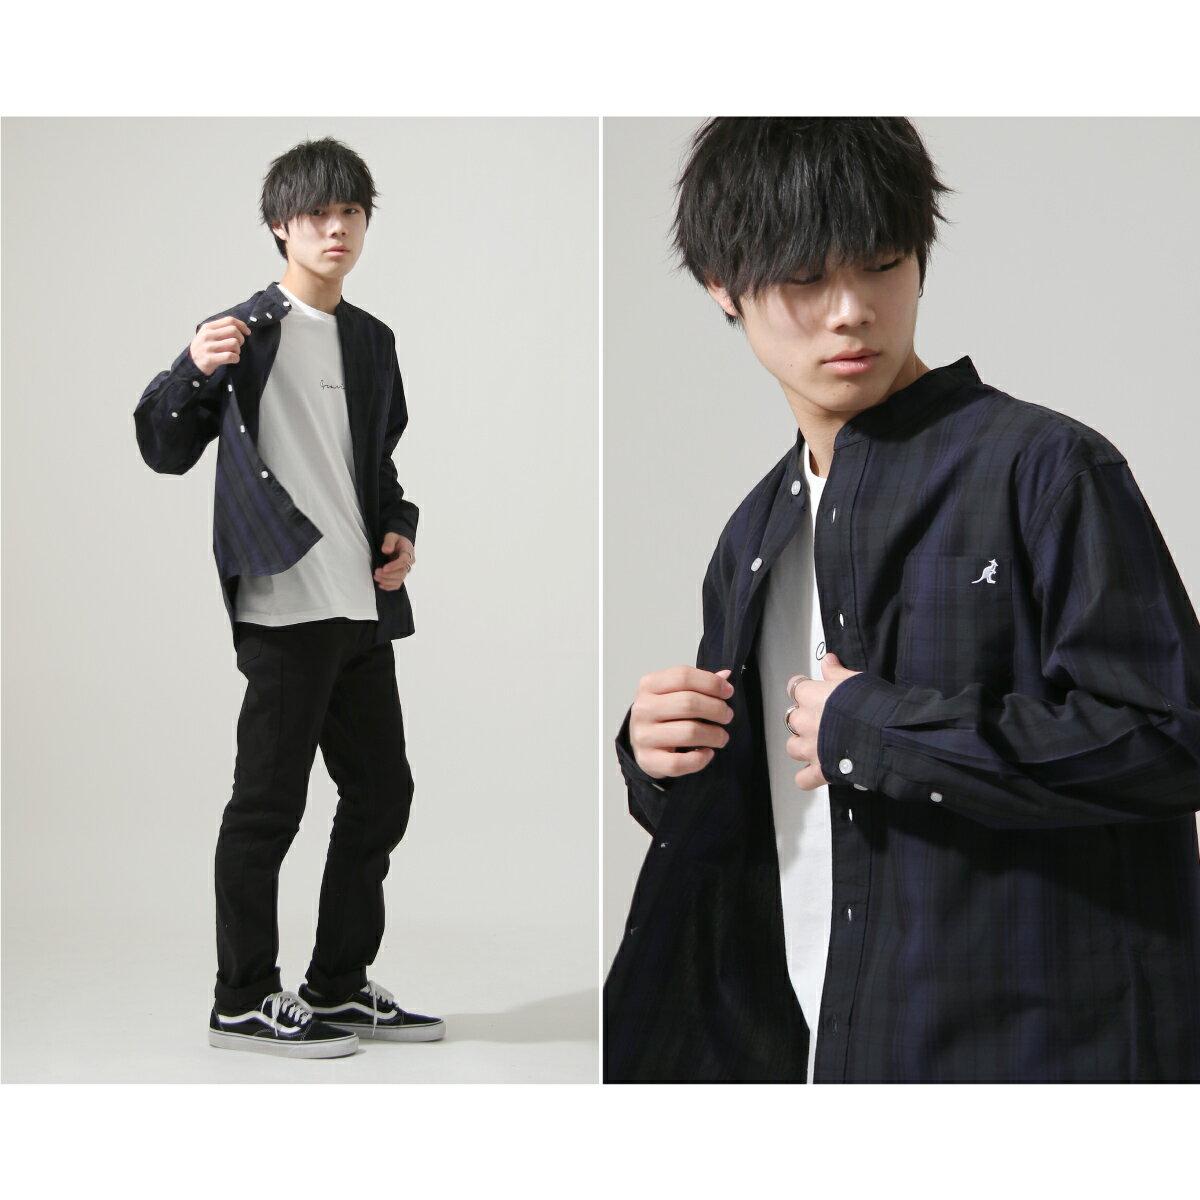 【New】KANGOL 立領襯衫 特注款 6